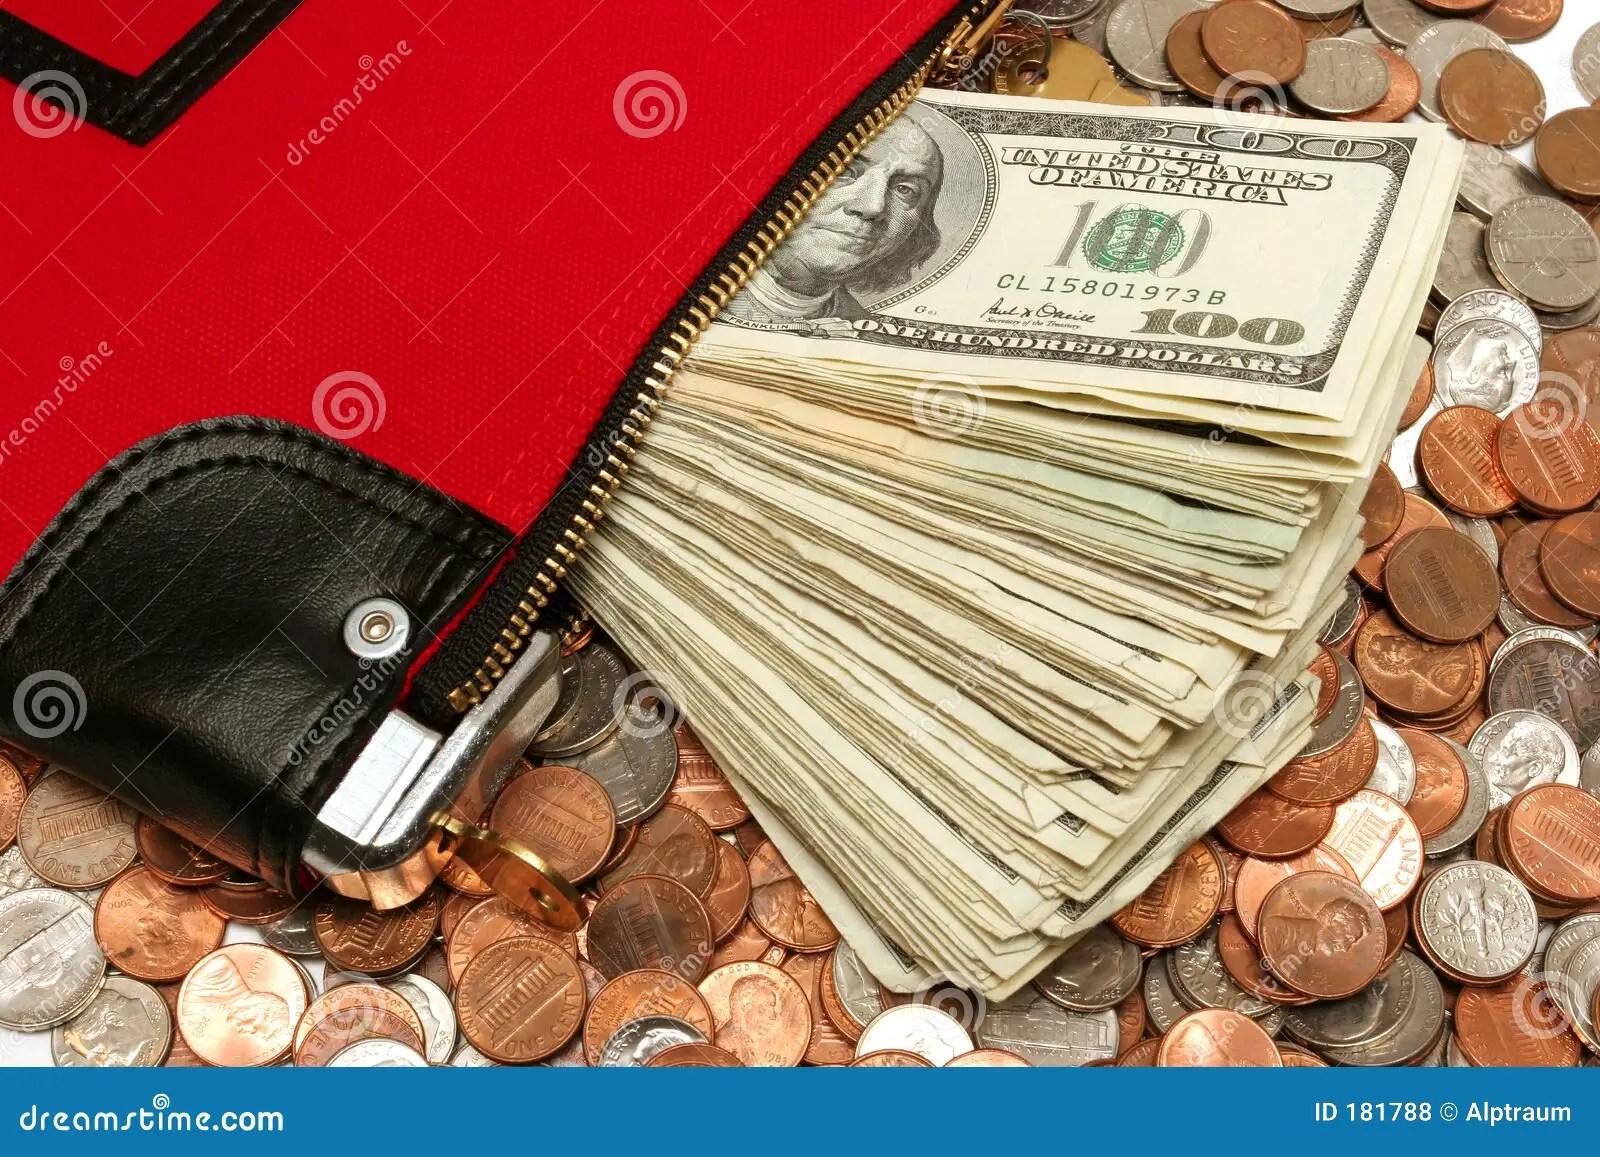 Security Bank Usd Time Deposit